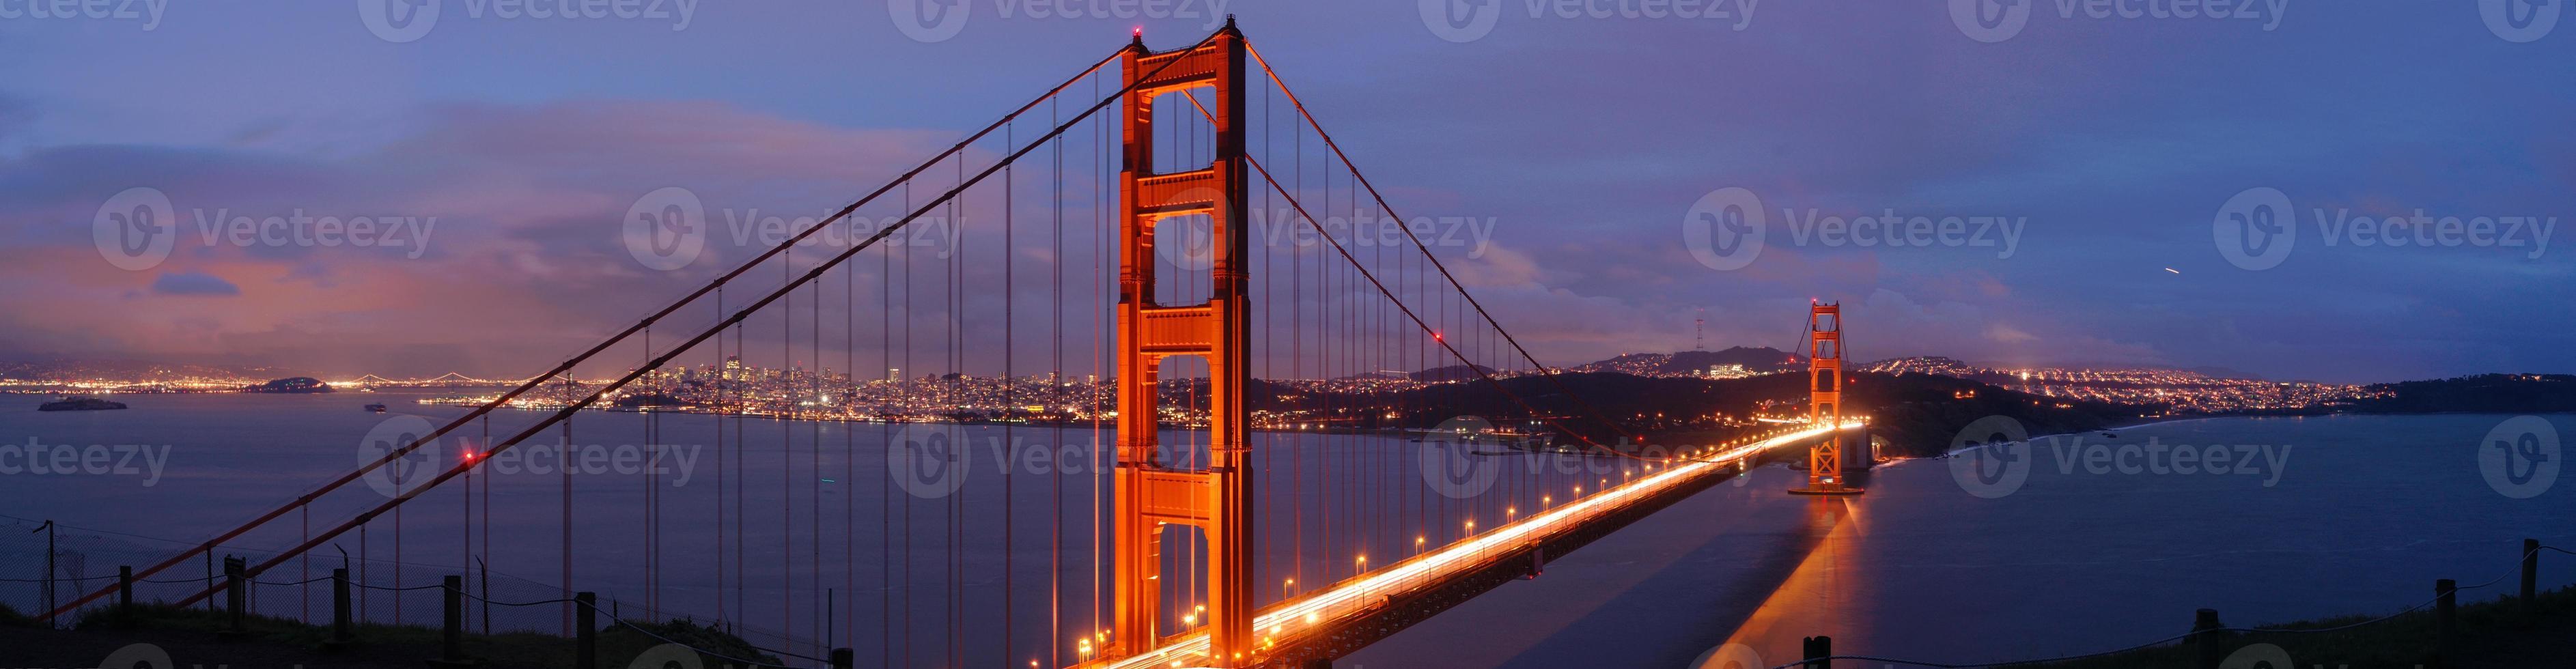 ponte golden gate ao entardecer foto